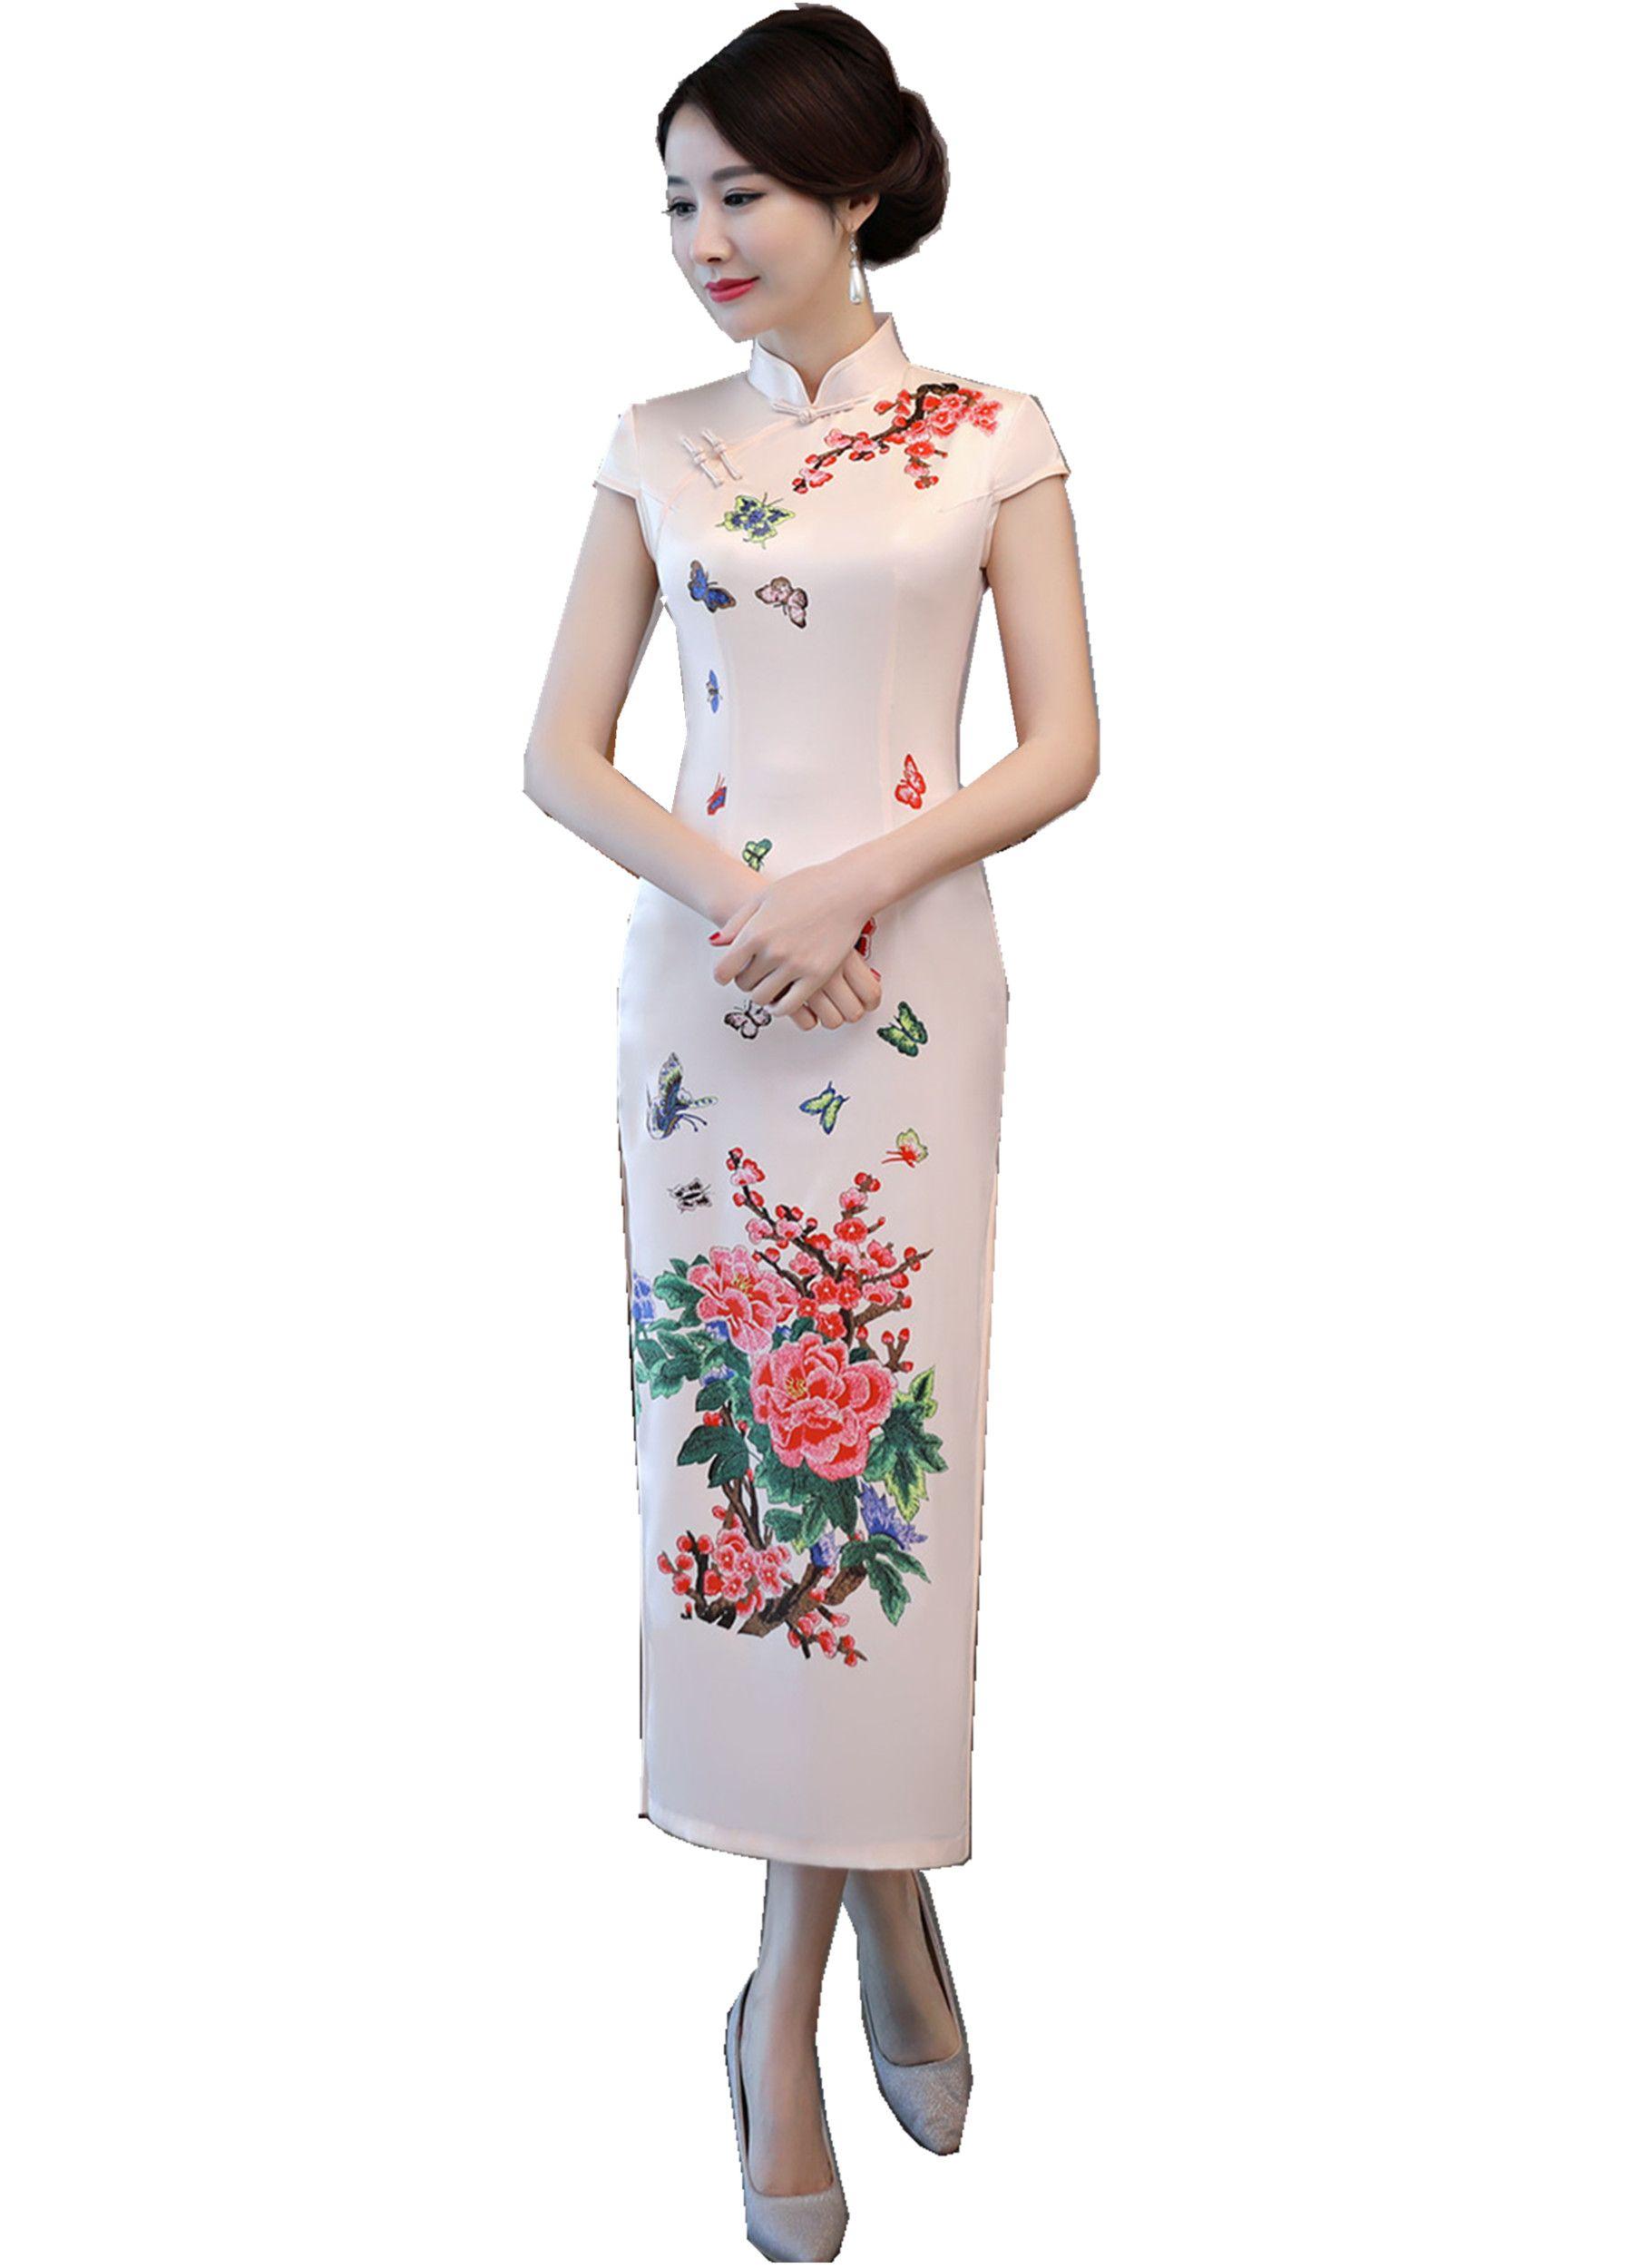 cd95375e9 Vestido Feminino História De Xangai Branco Qipao Chinês Tradicional Vestido  Vestido De Estilo Chinês Vestido Oriental Longo Cheongsam Vestidos De  Noivas De ...